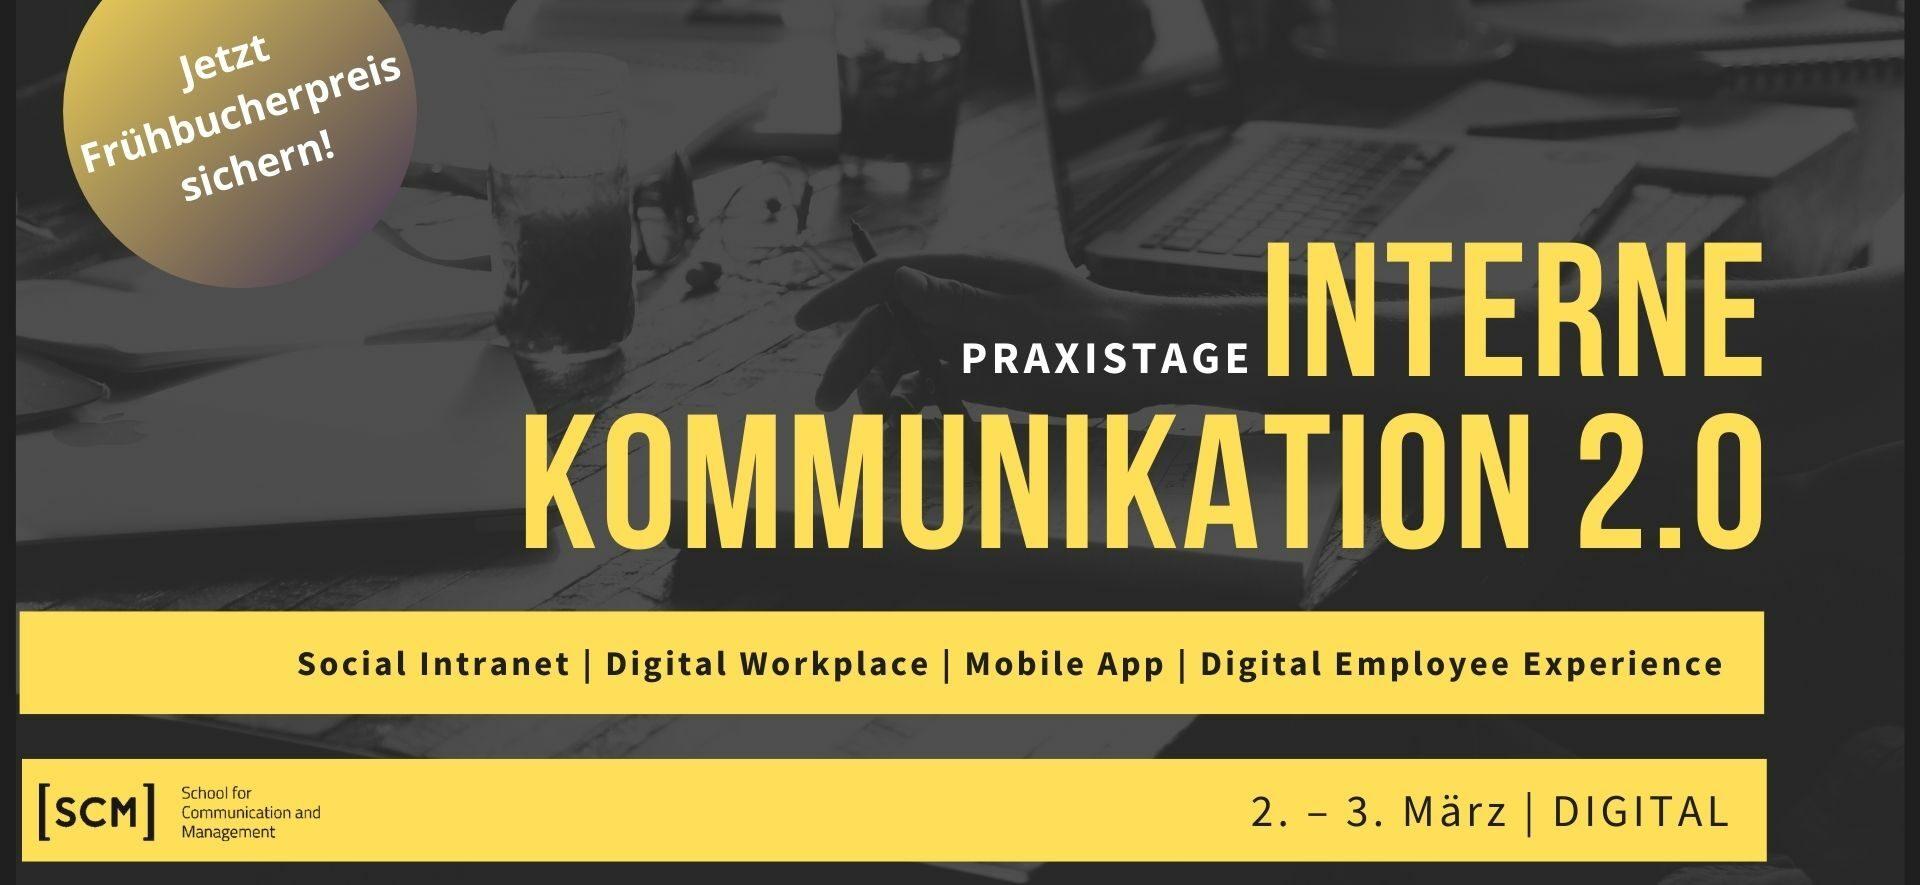 Praxistage Interne Kommunikation 2.0